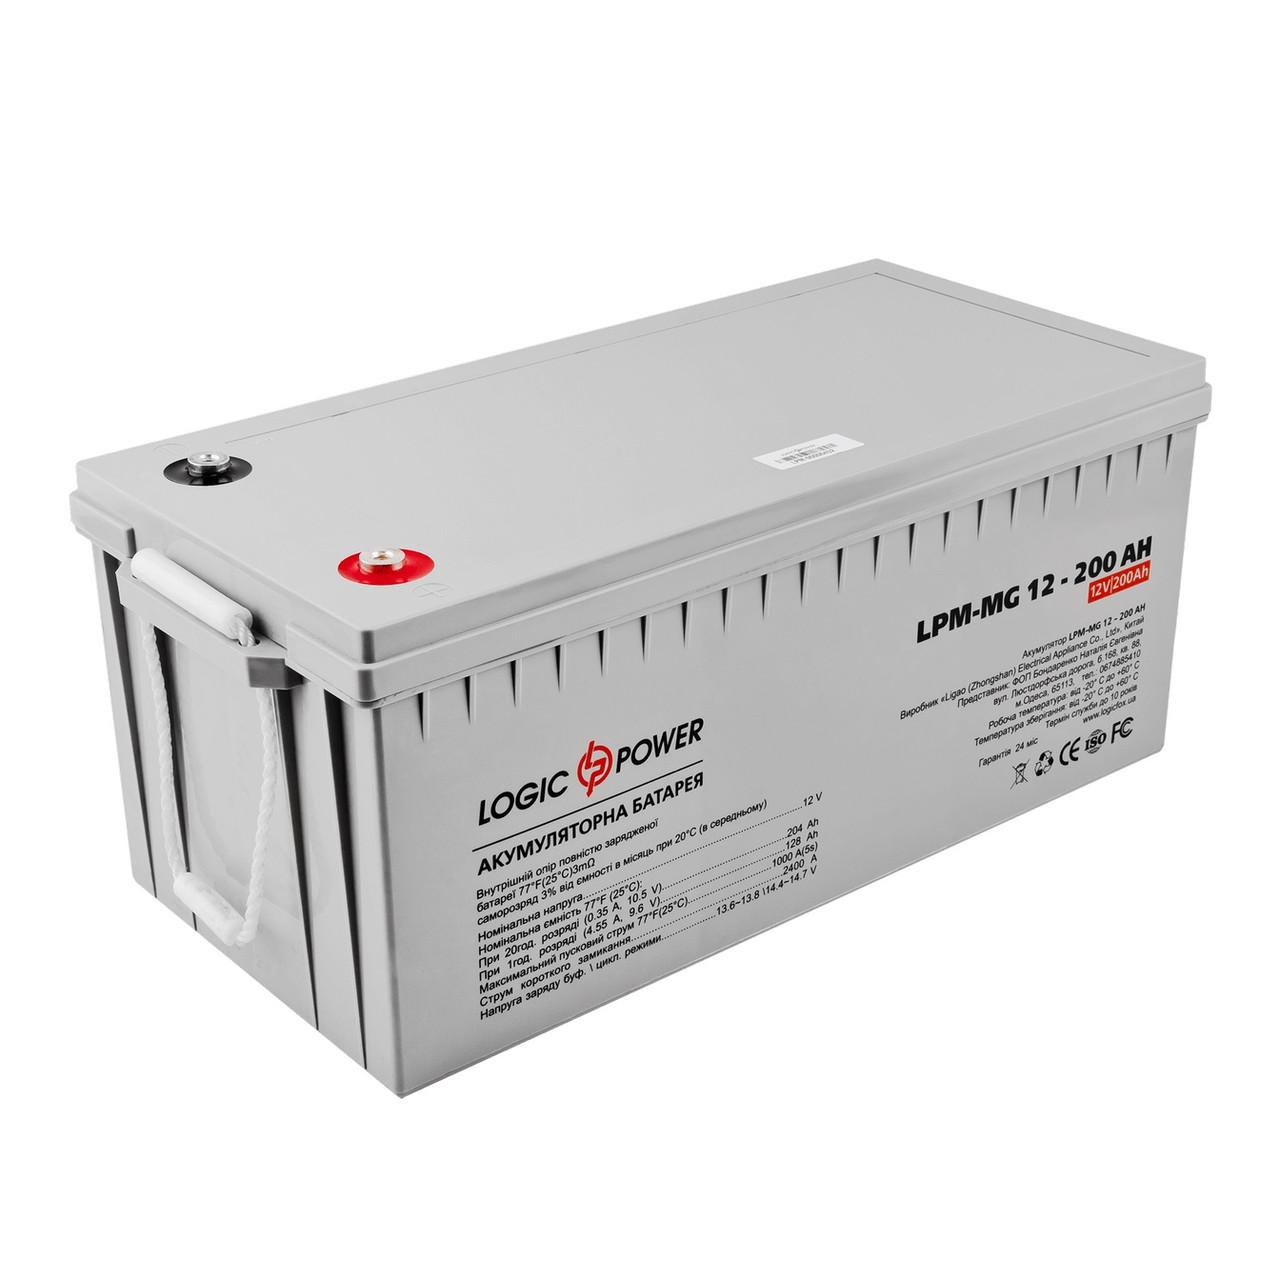 Аккумулятор мультигелевый LogicPower AGM LPM-MG 12 - 200Ah